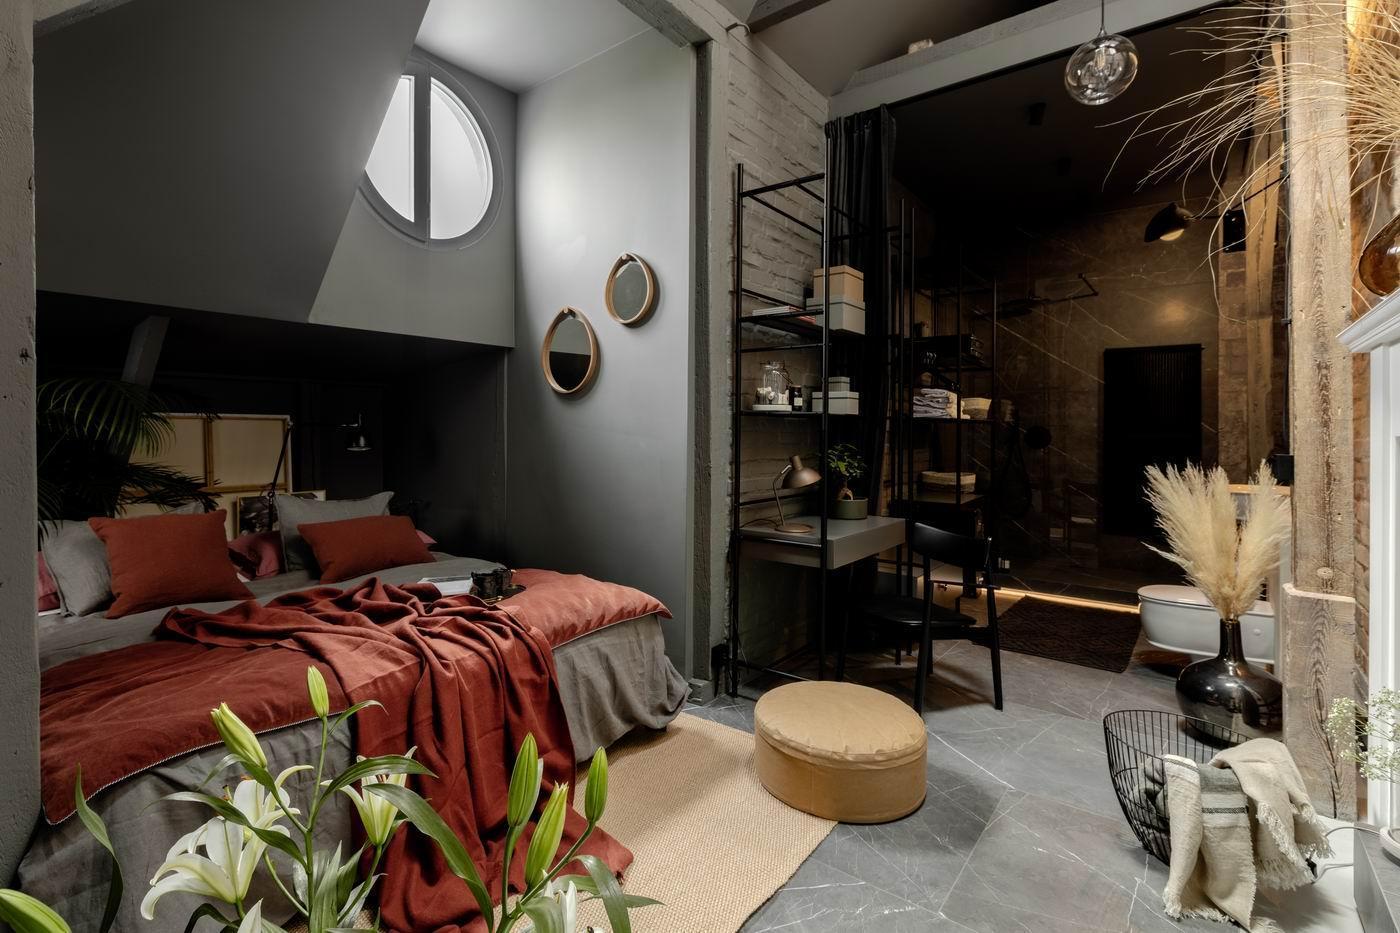 ROOMTONES - Mysticloft - Warszawa - Where will I sleep?